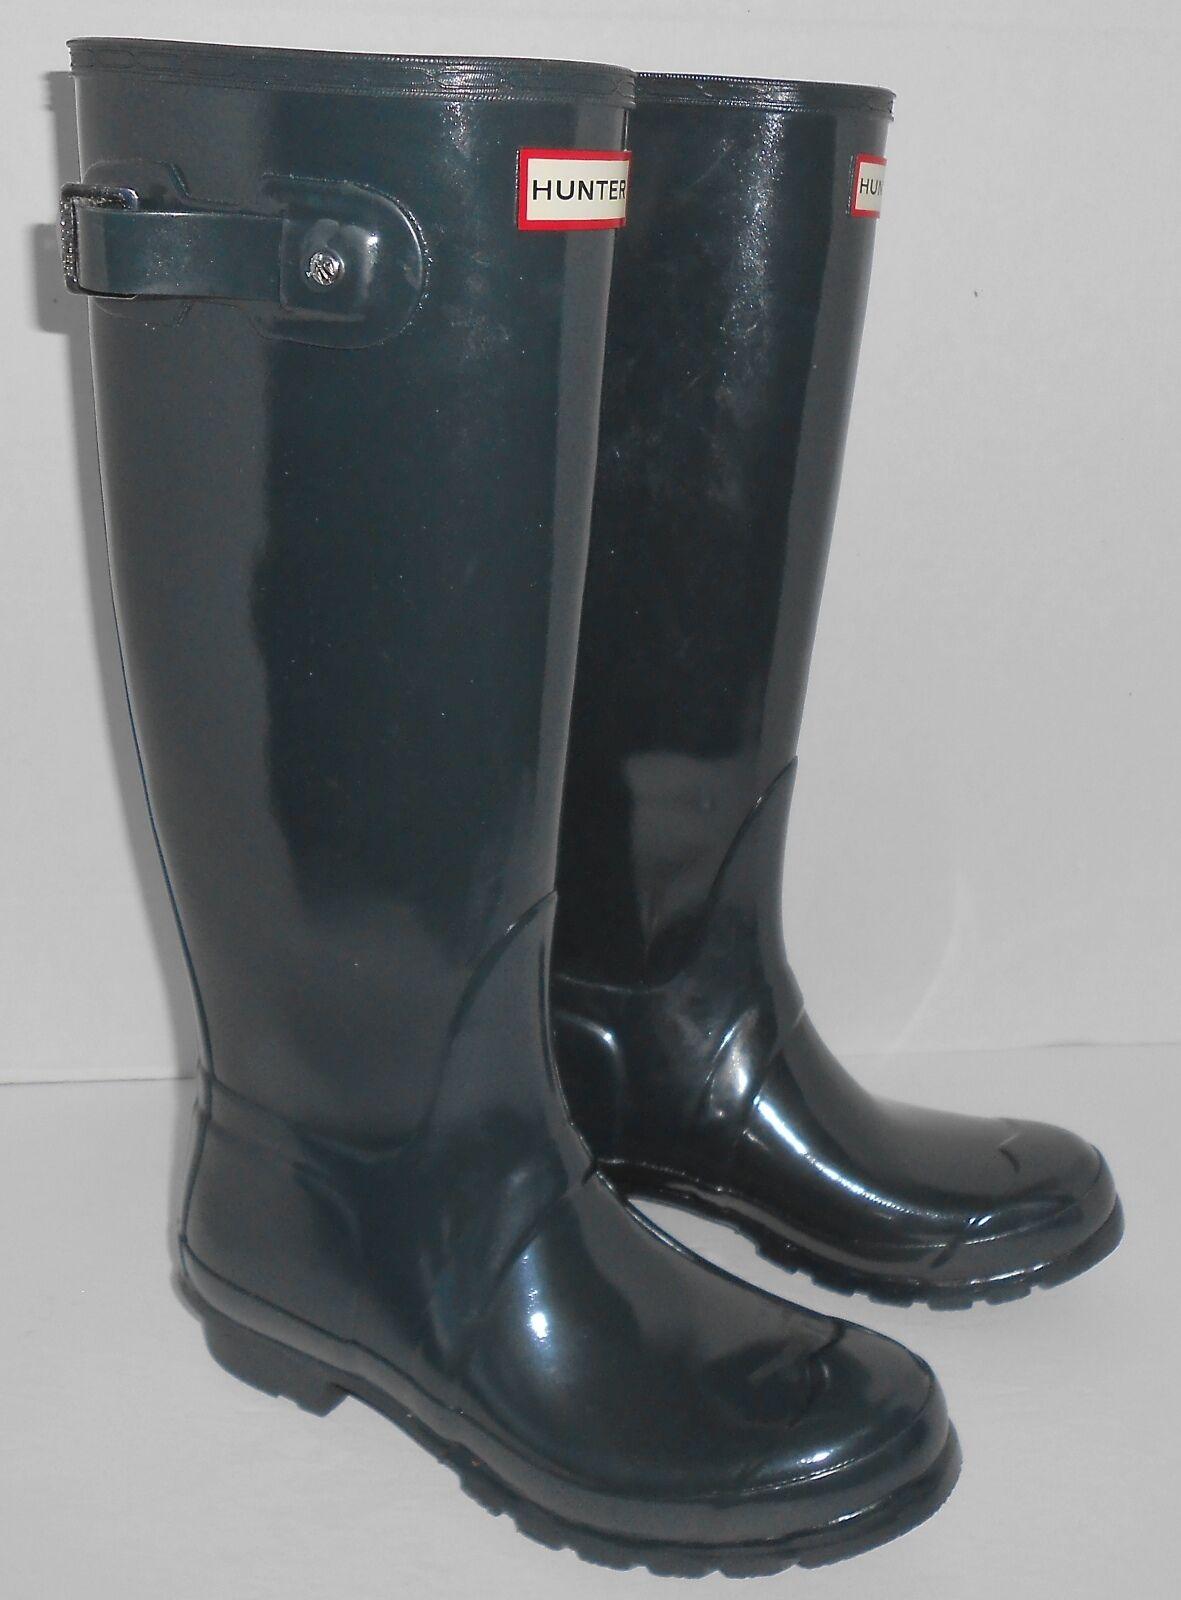 Hunter Women's Original Tall Glossy Rain Boots color Graphite Gloss Sz 7